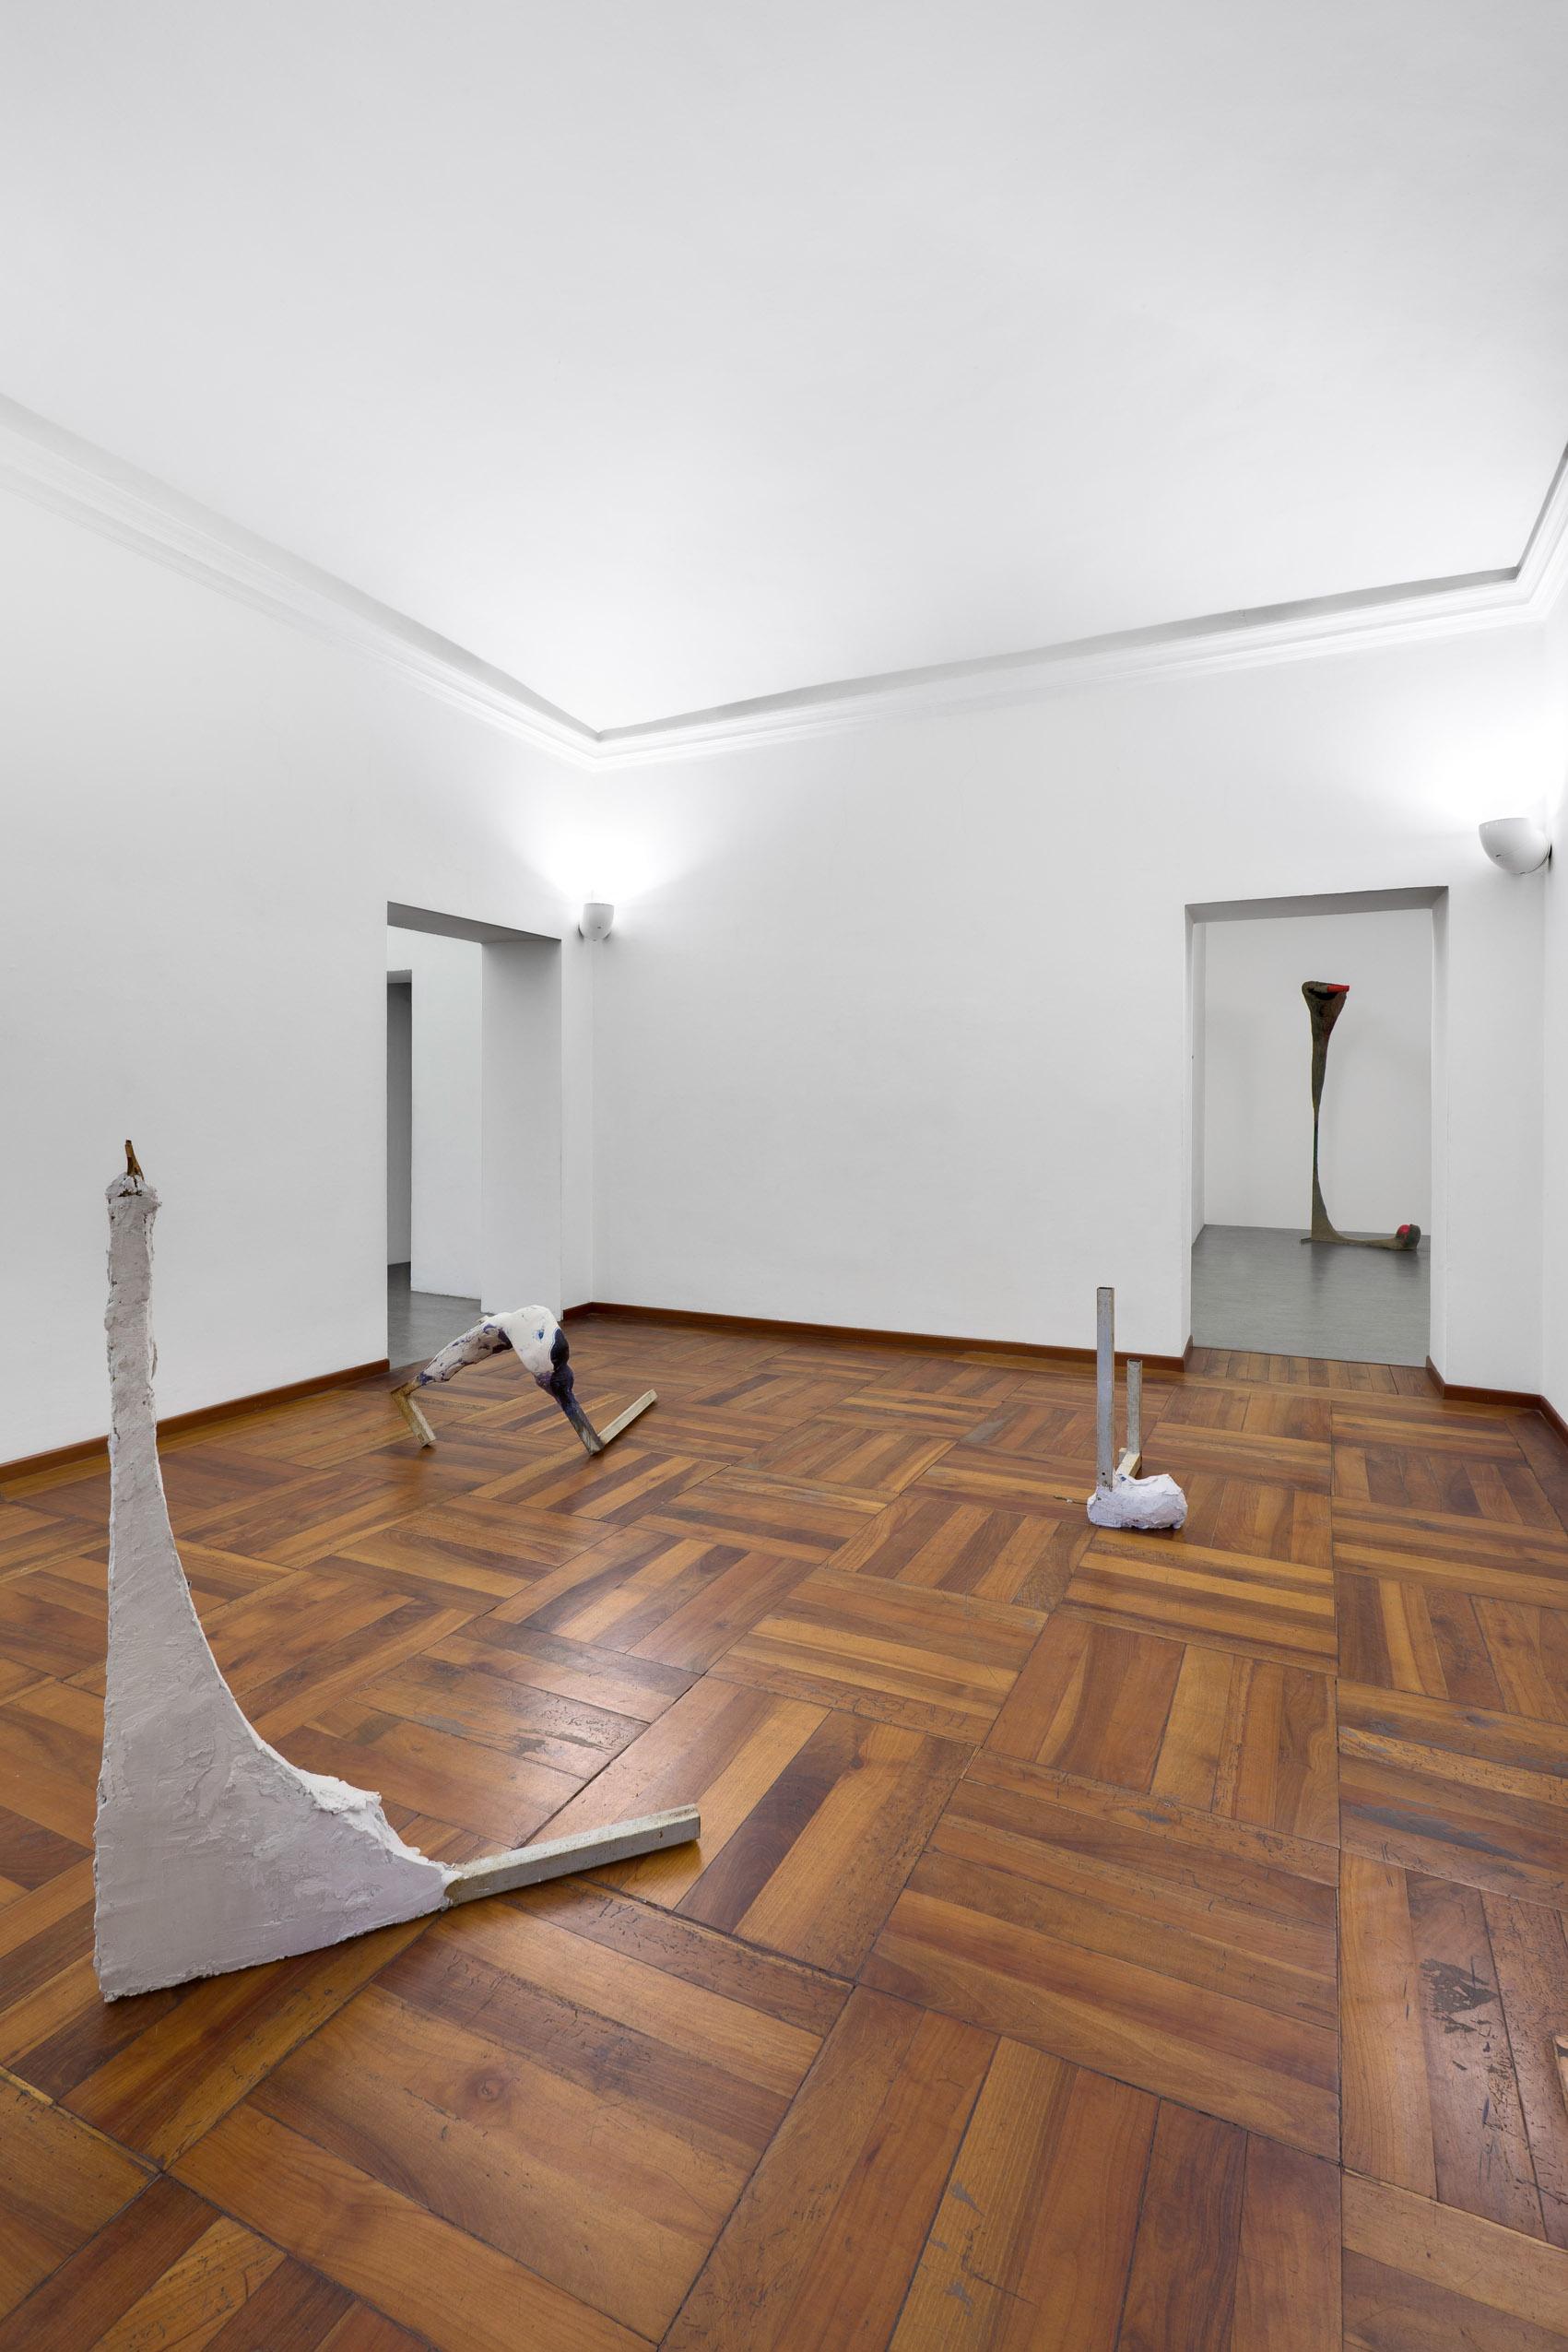 Francesca-Ferreri-Cluster-Clutter-installation-view-2